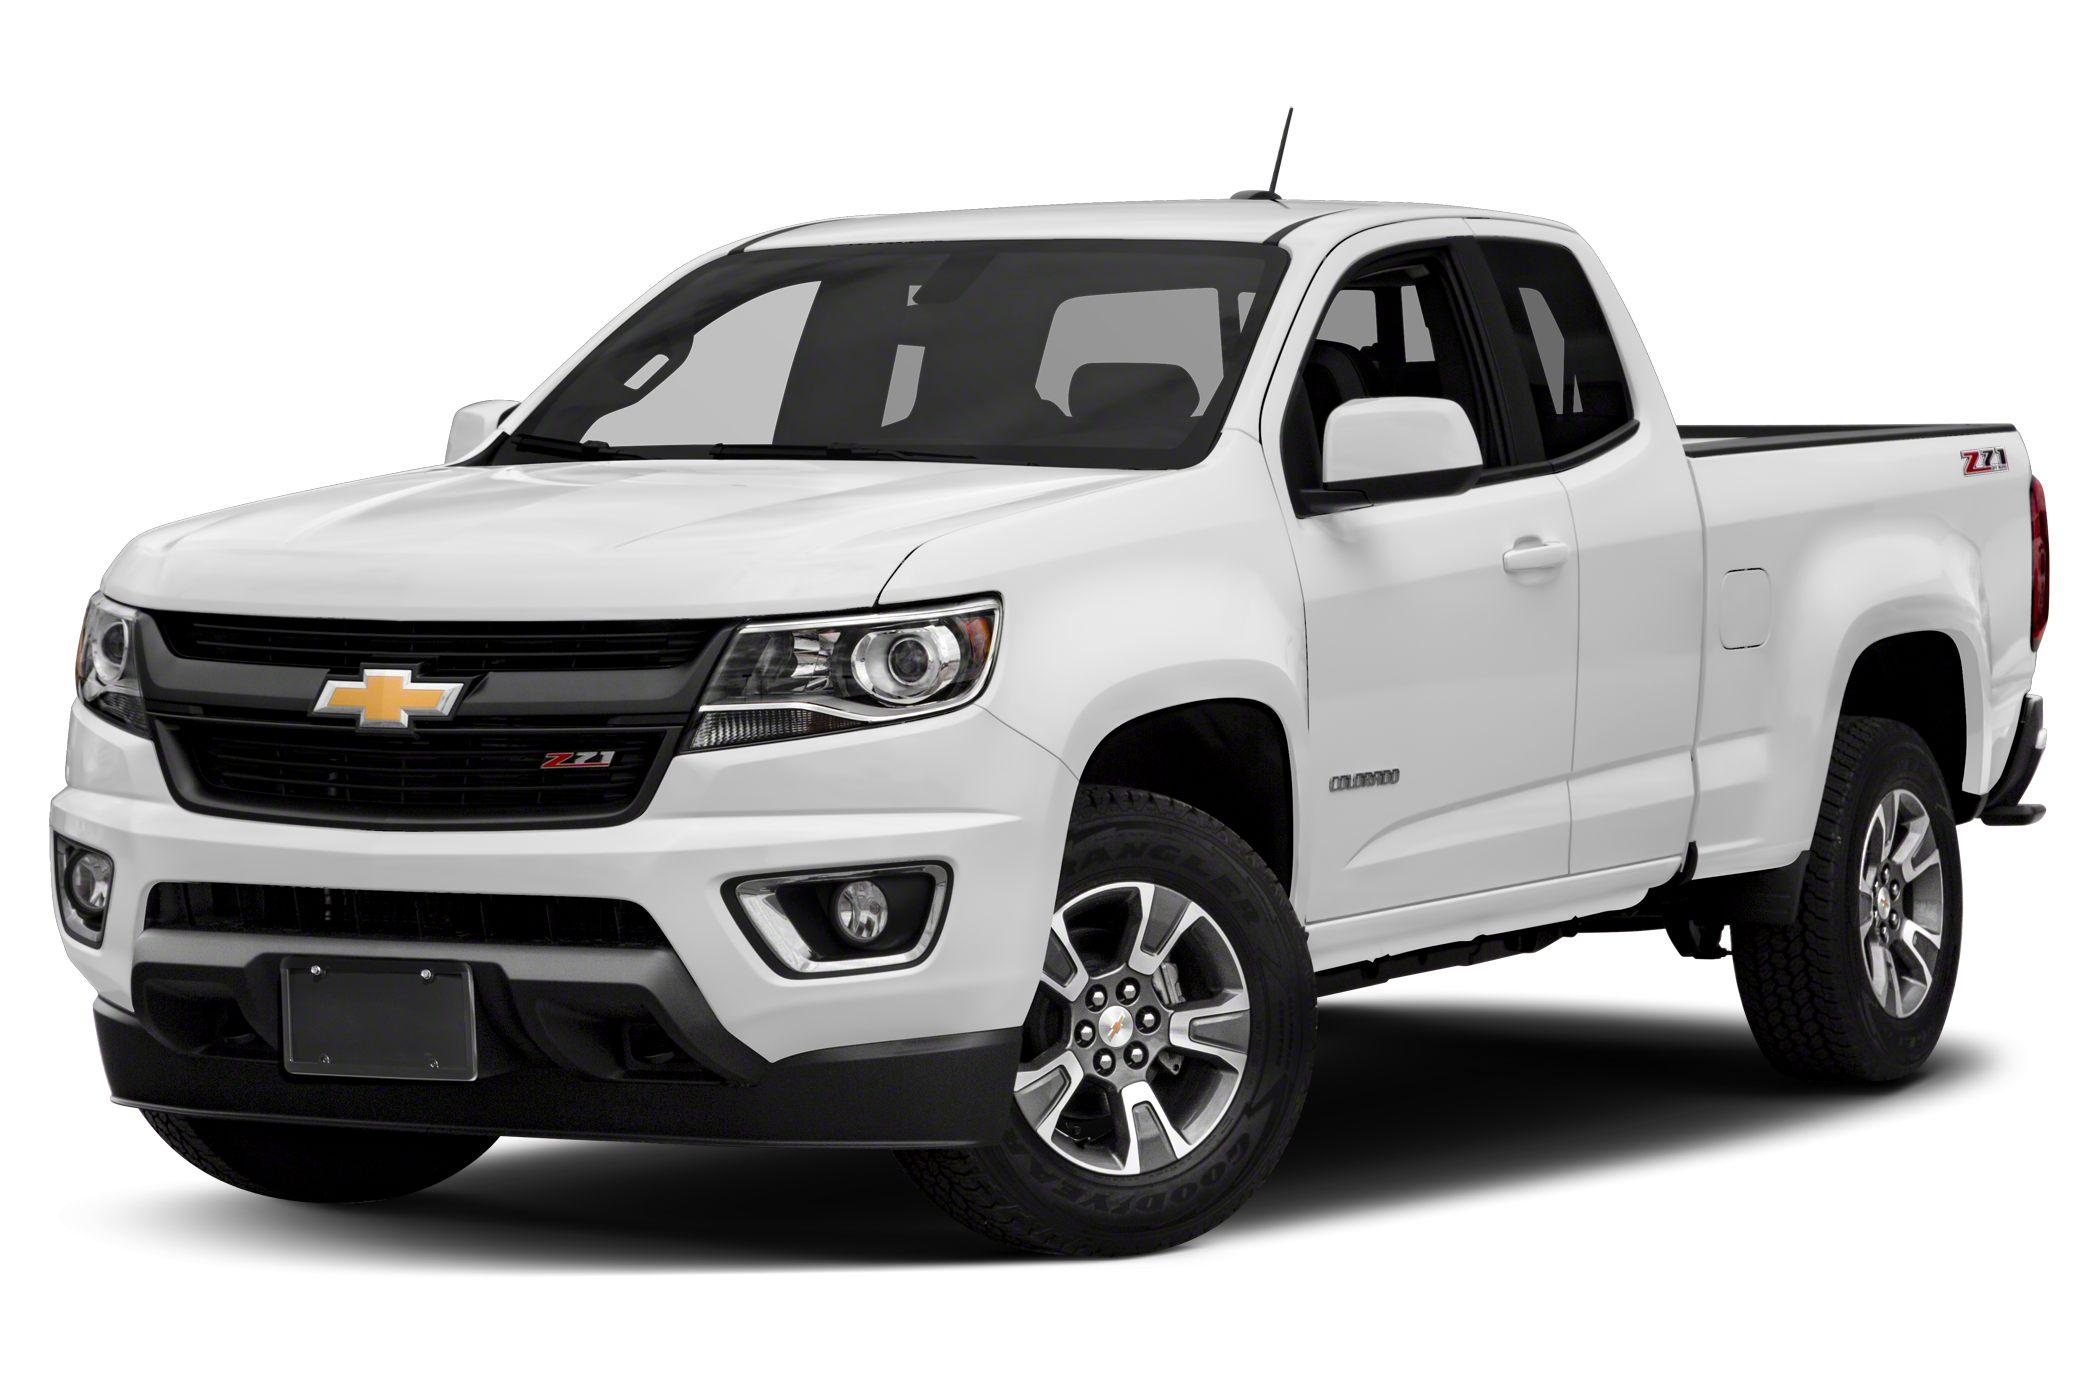 2017 Chevrolet Colorado Z71 Miles 198Color Cajun Red Stock 177842 VIN 1GCHSDEN4H1244071